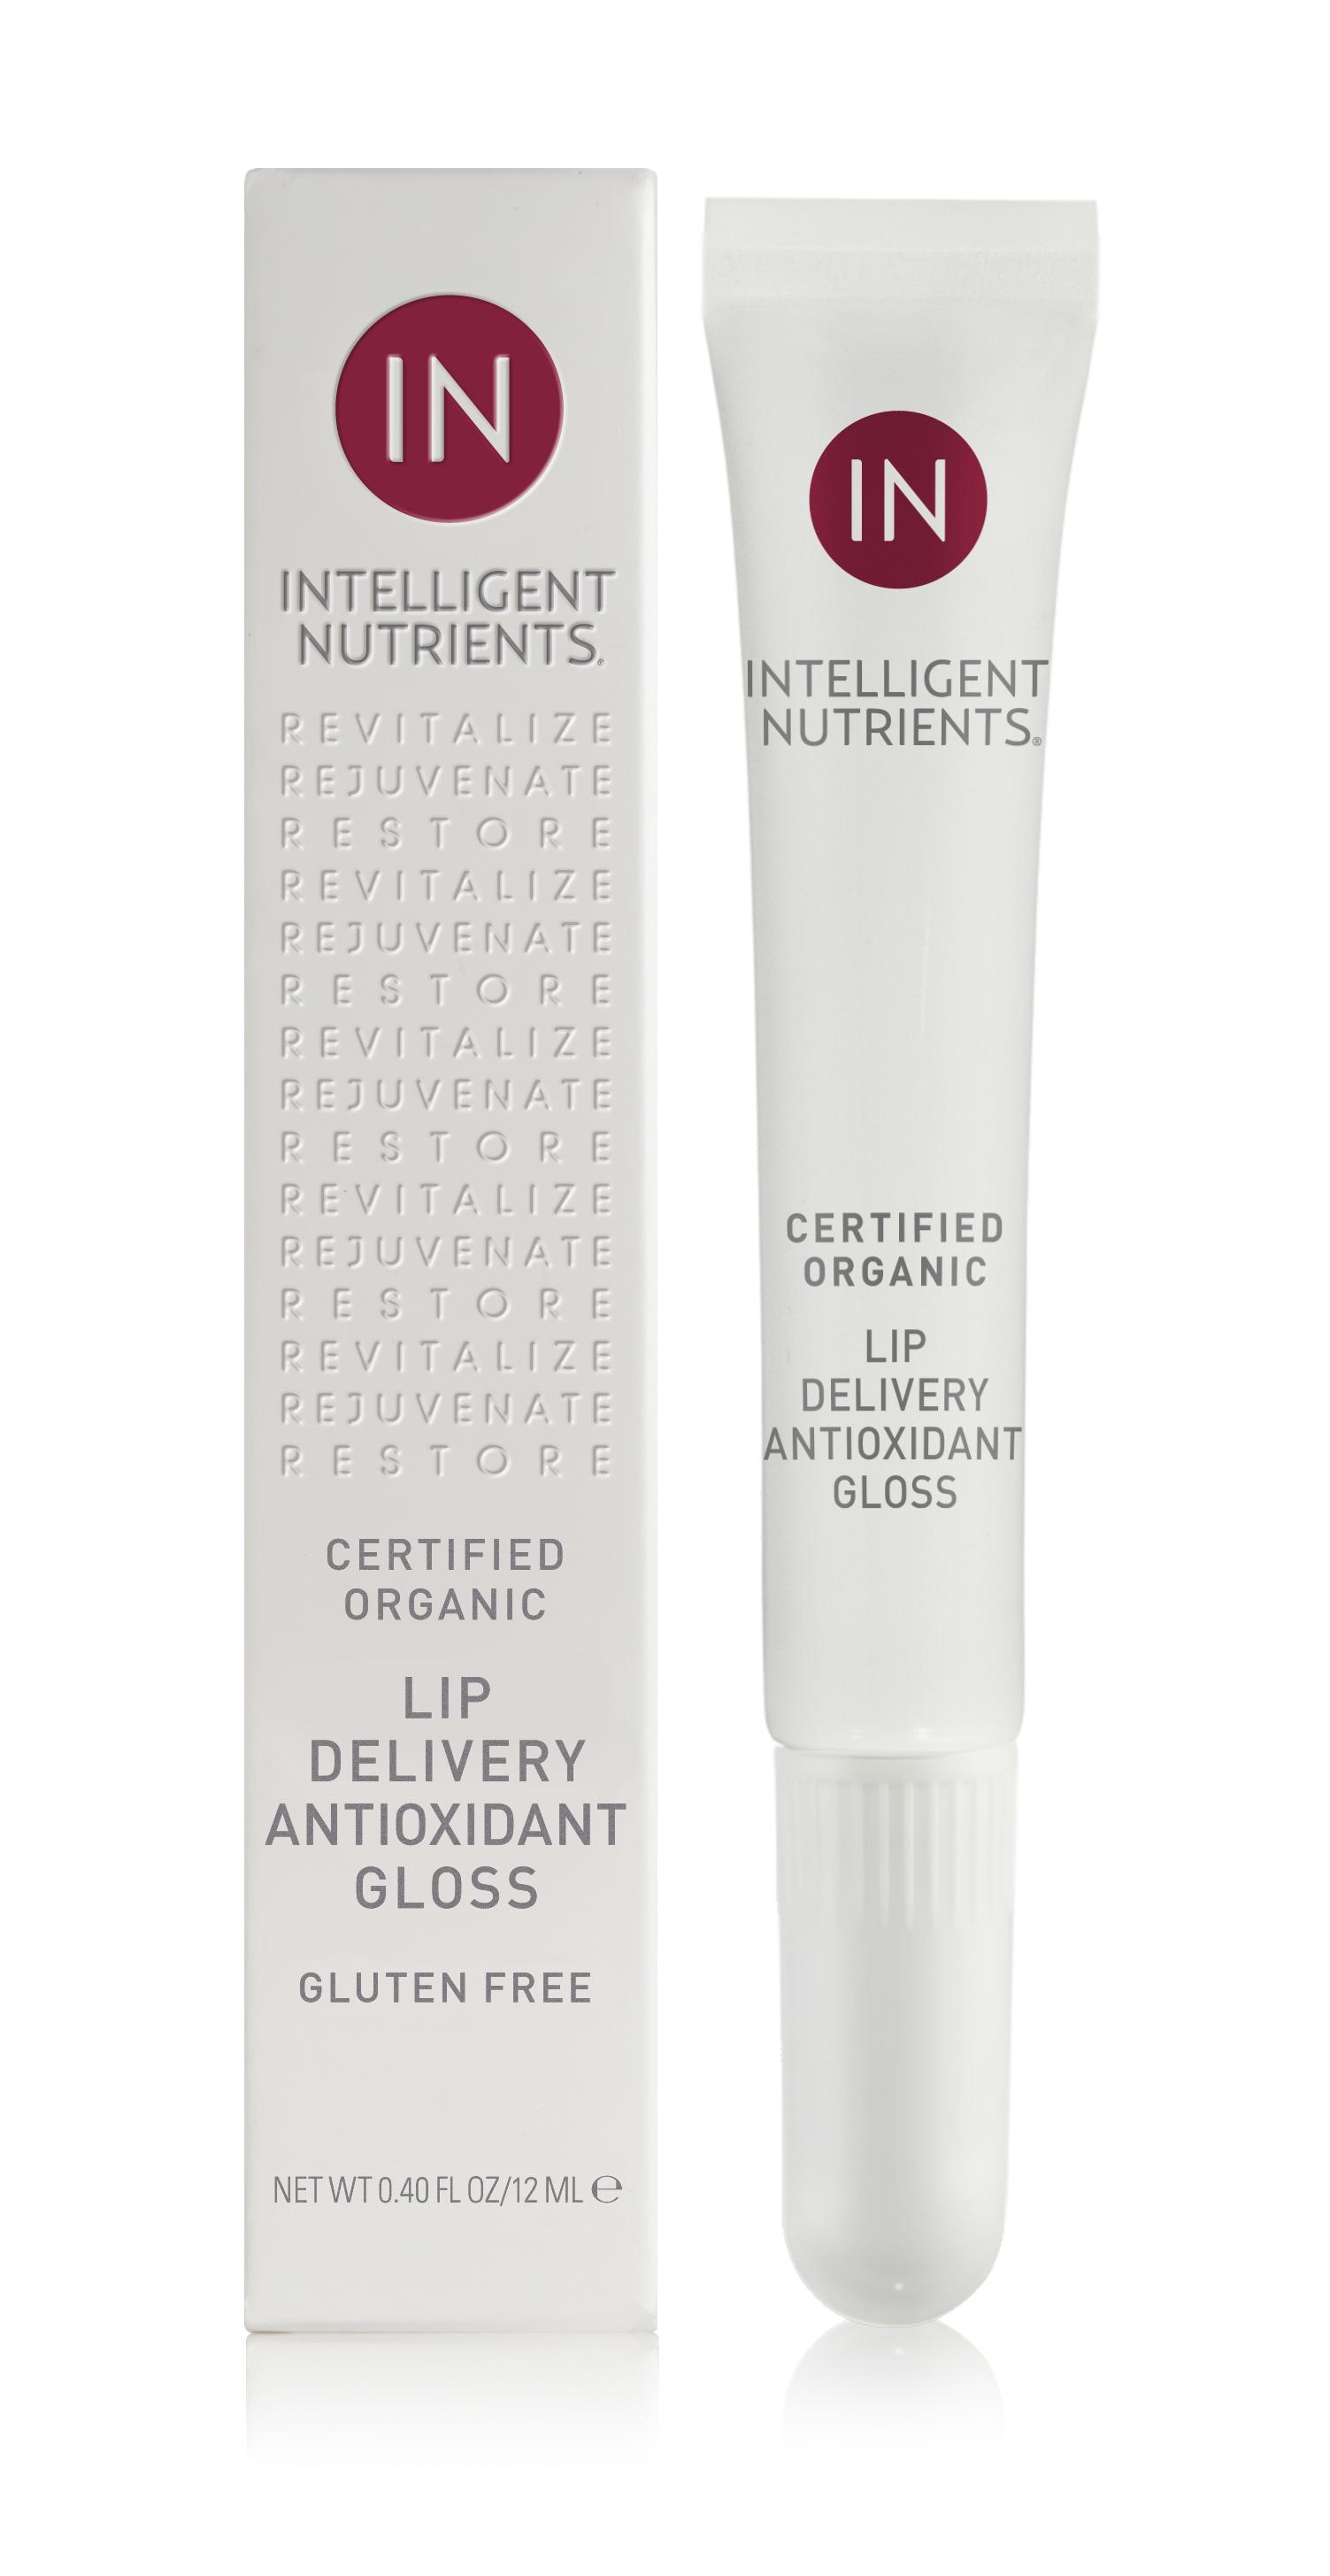 Lip Delivery Antioxidant Gloss - Purple Maize (DKK190/12g)